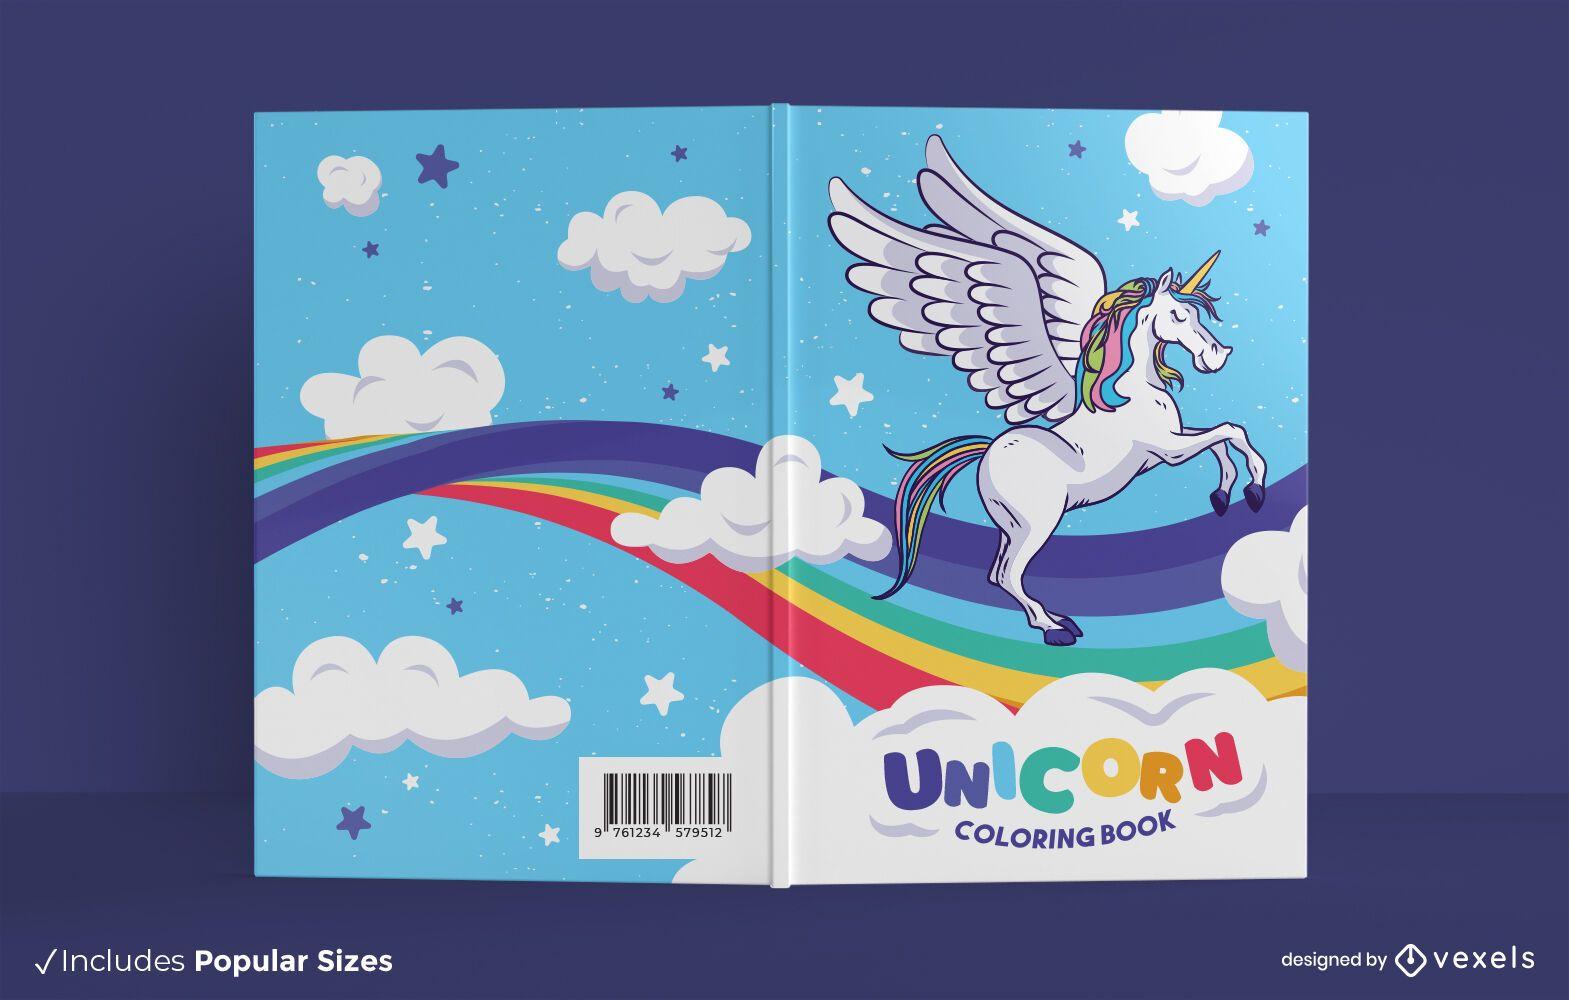 Lindo diseño de portada de libro para colorear de unicornio